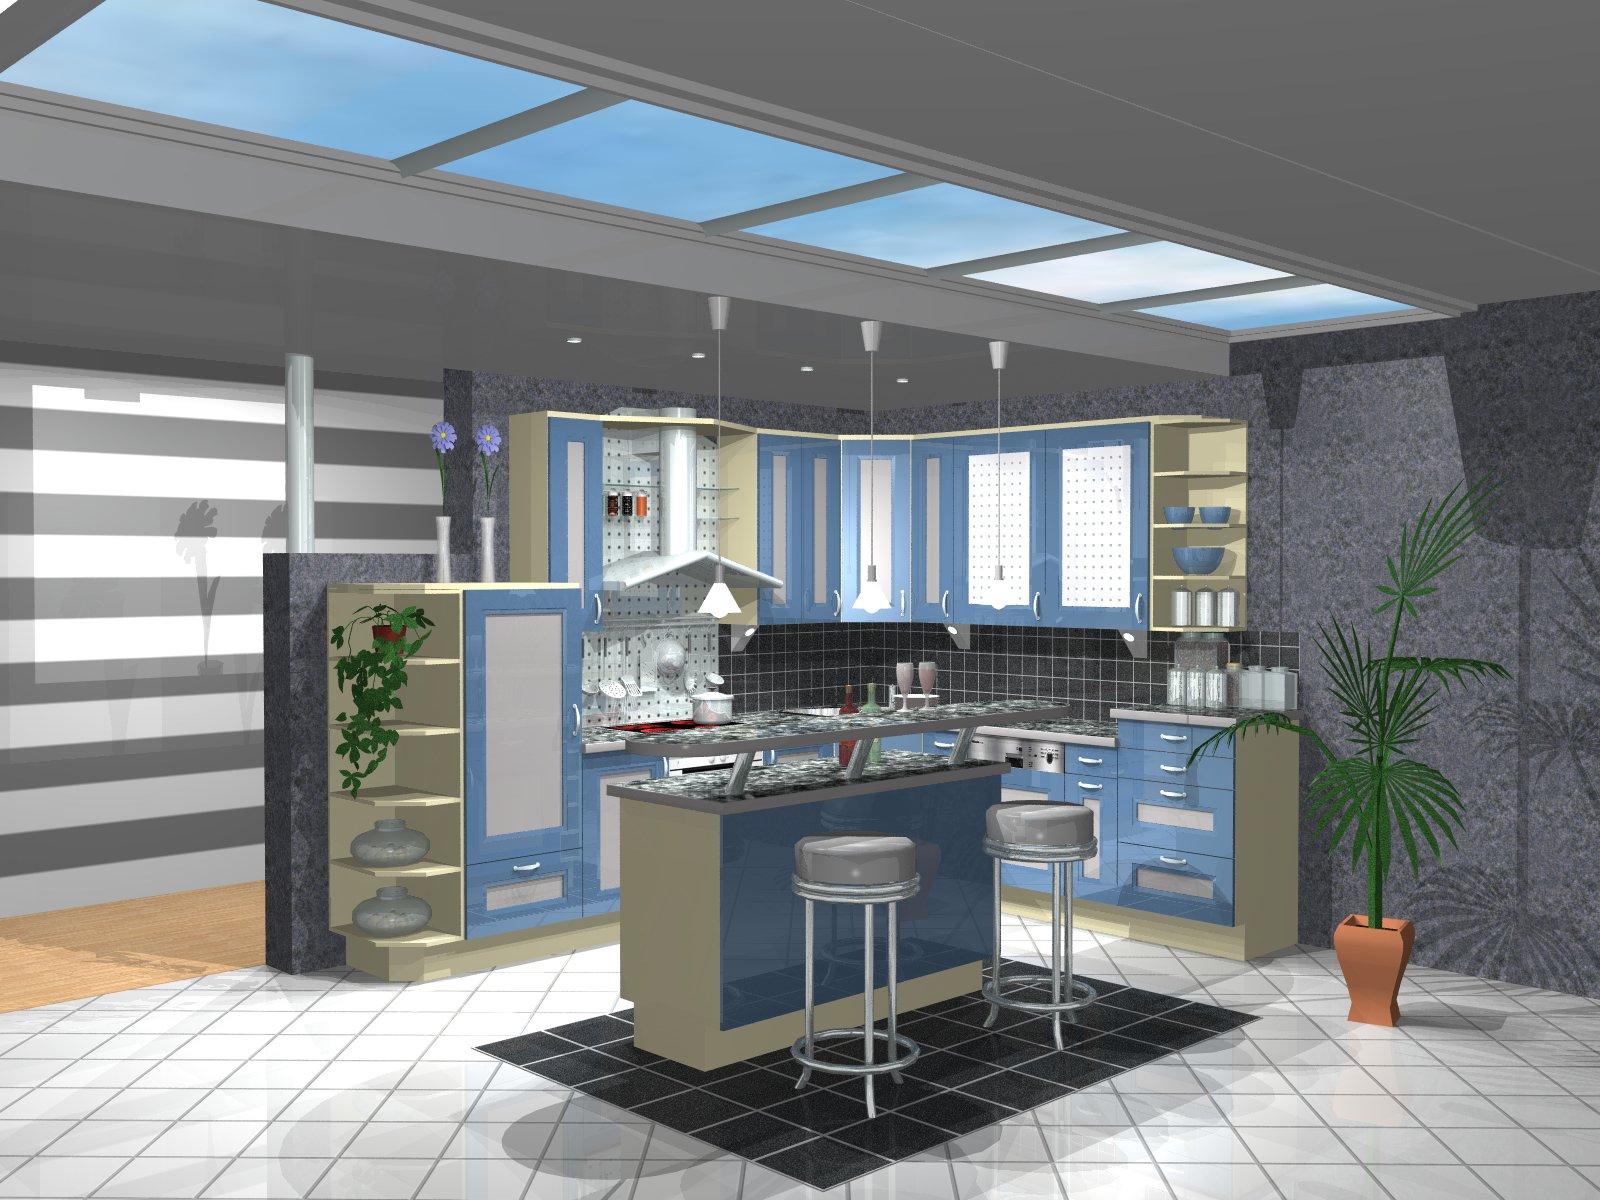 profi k chen wuppertal k chenstudio. Black Bedroom Furniture Sets. Home Design Ideas